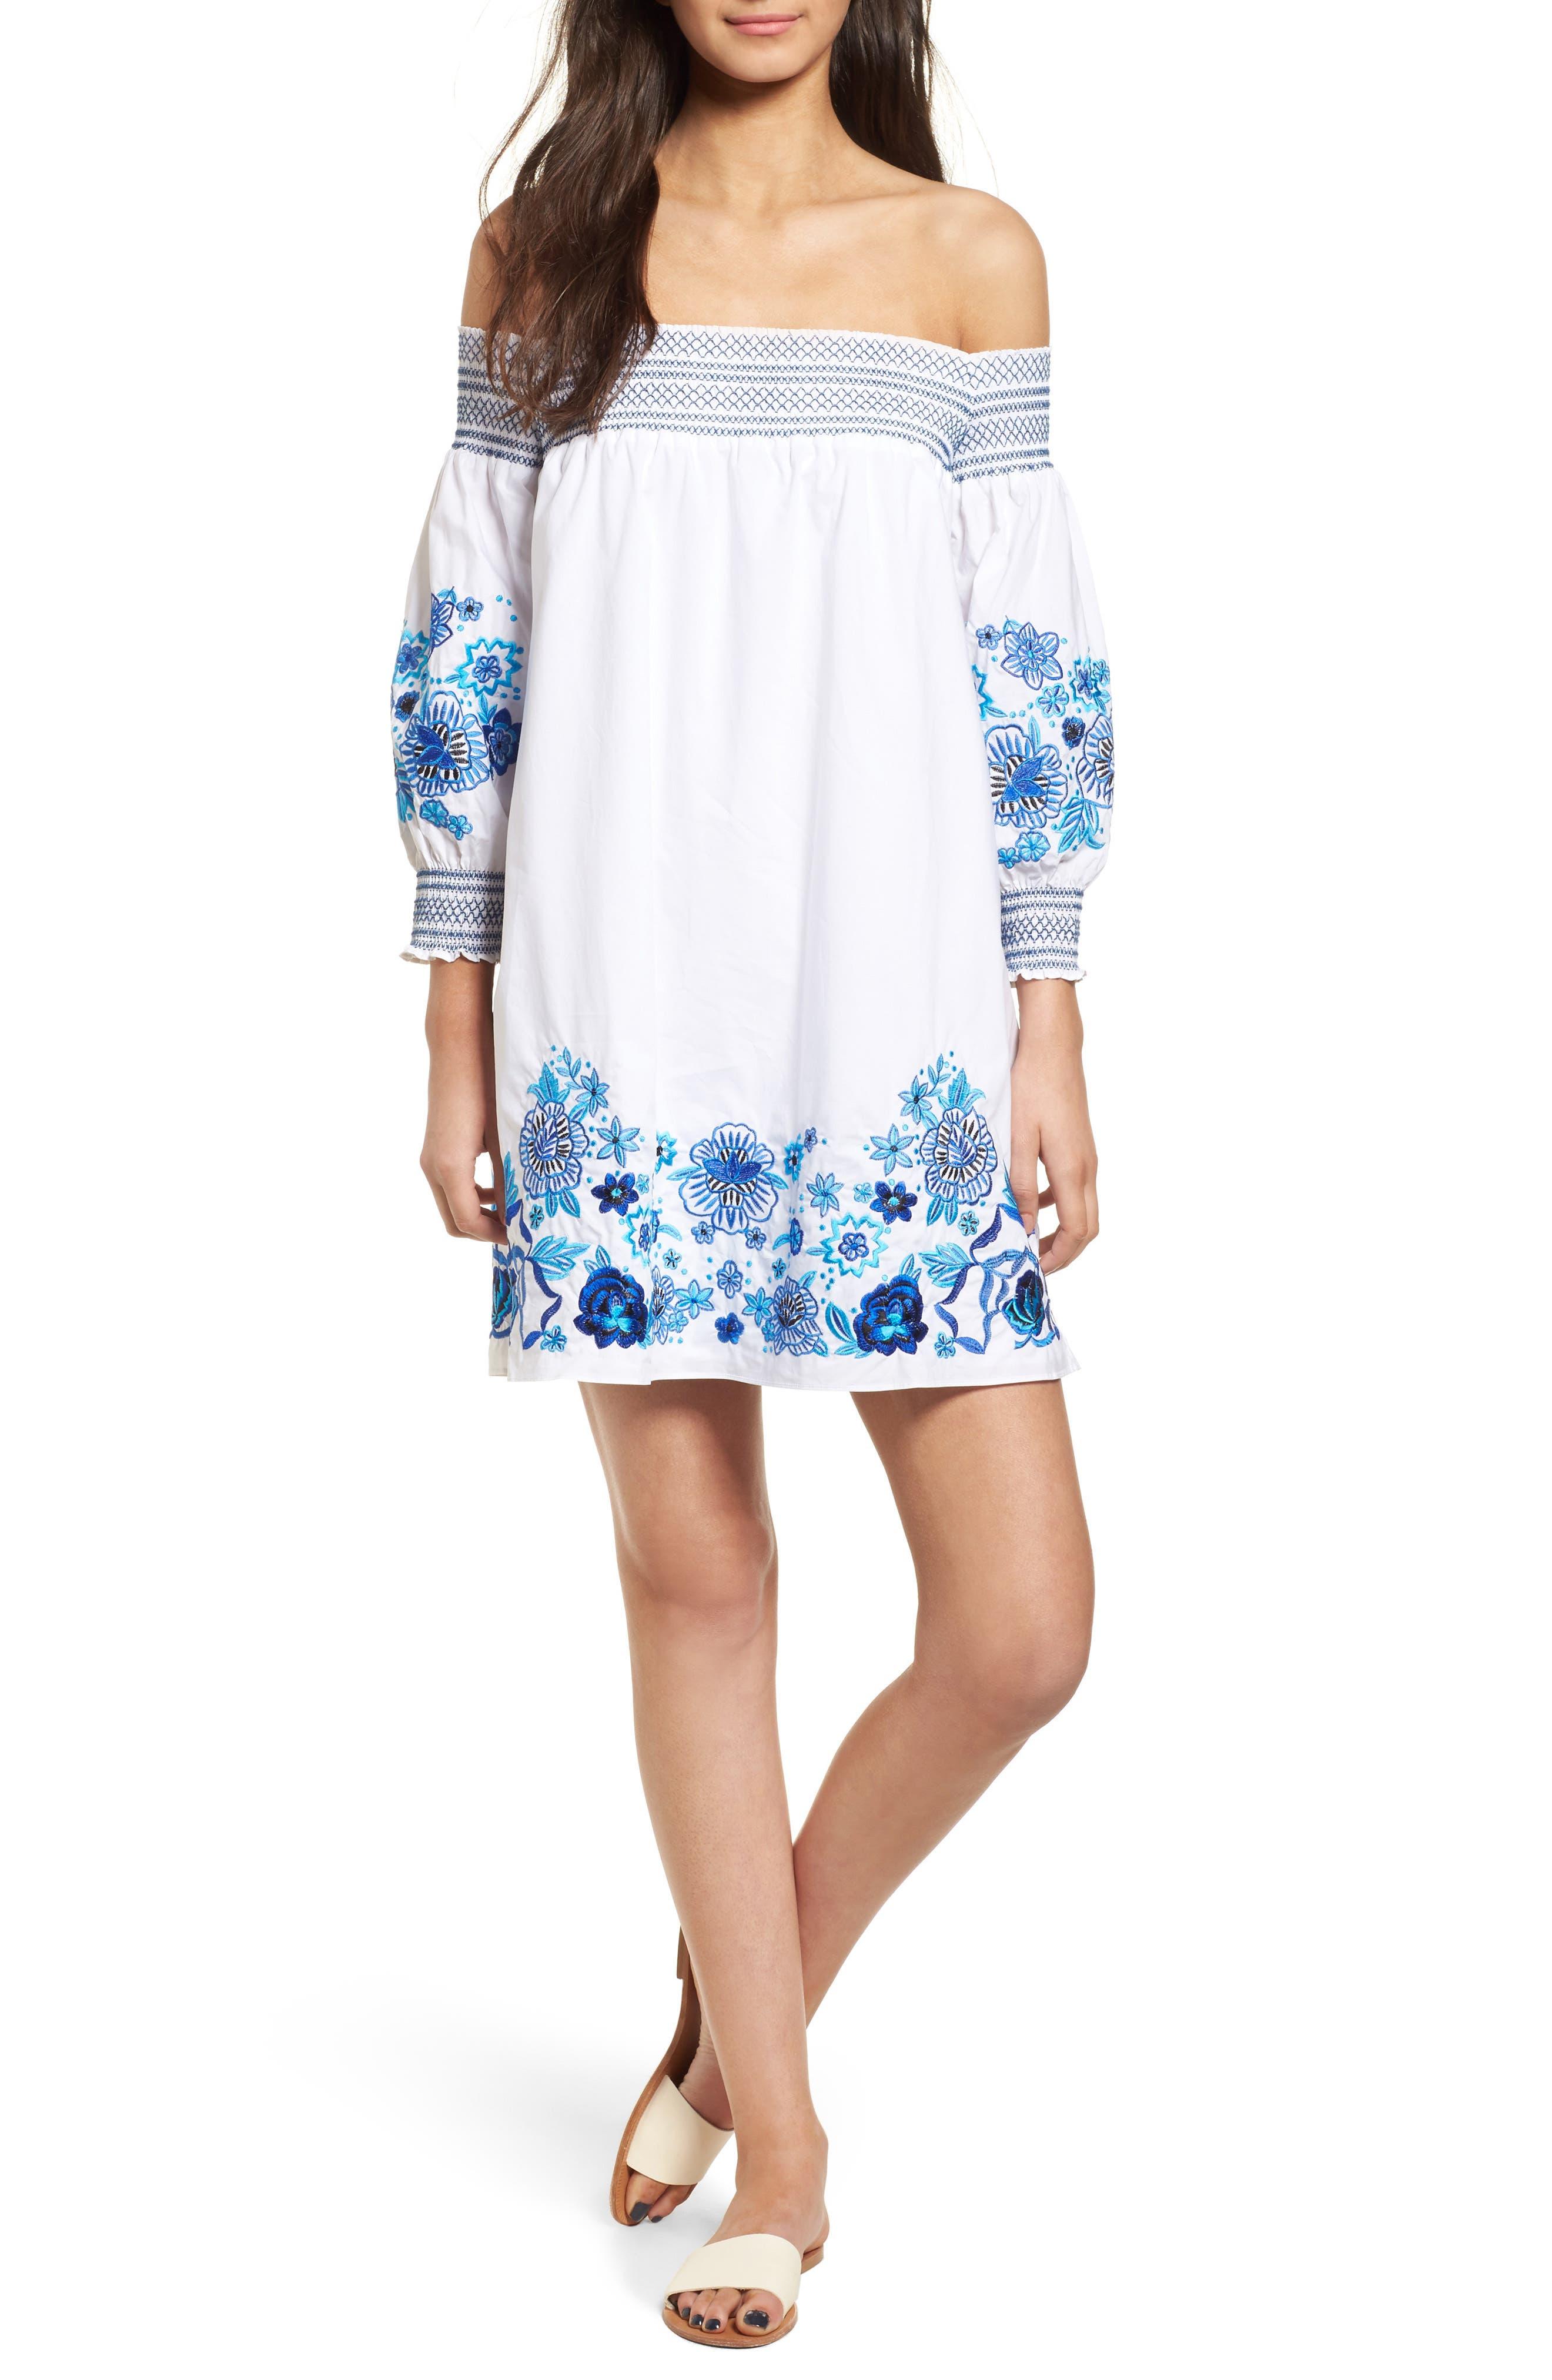 Jace Embroidered Off the Shoulder Shift Dress,                         Main,                         color, White